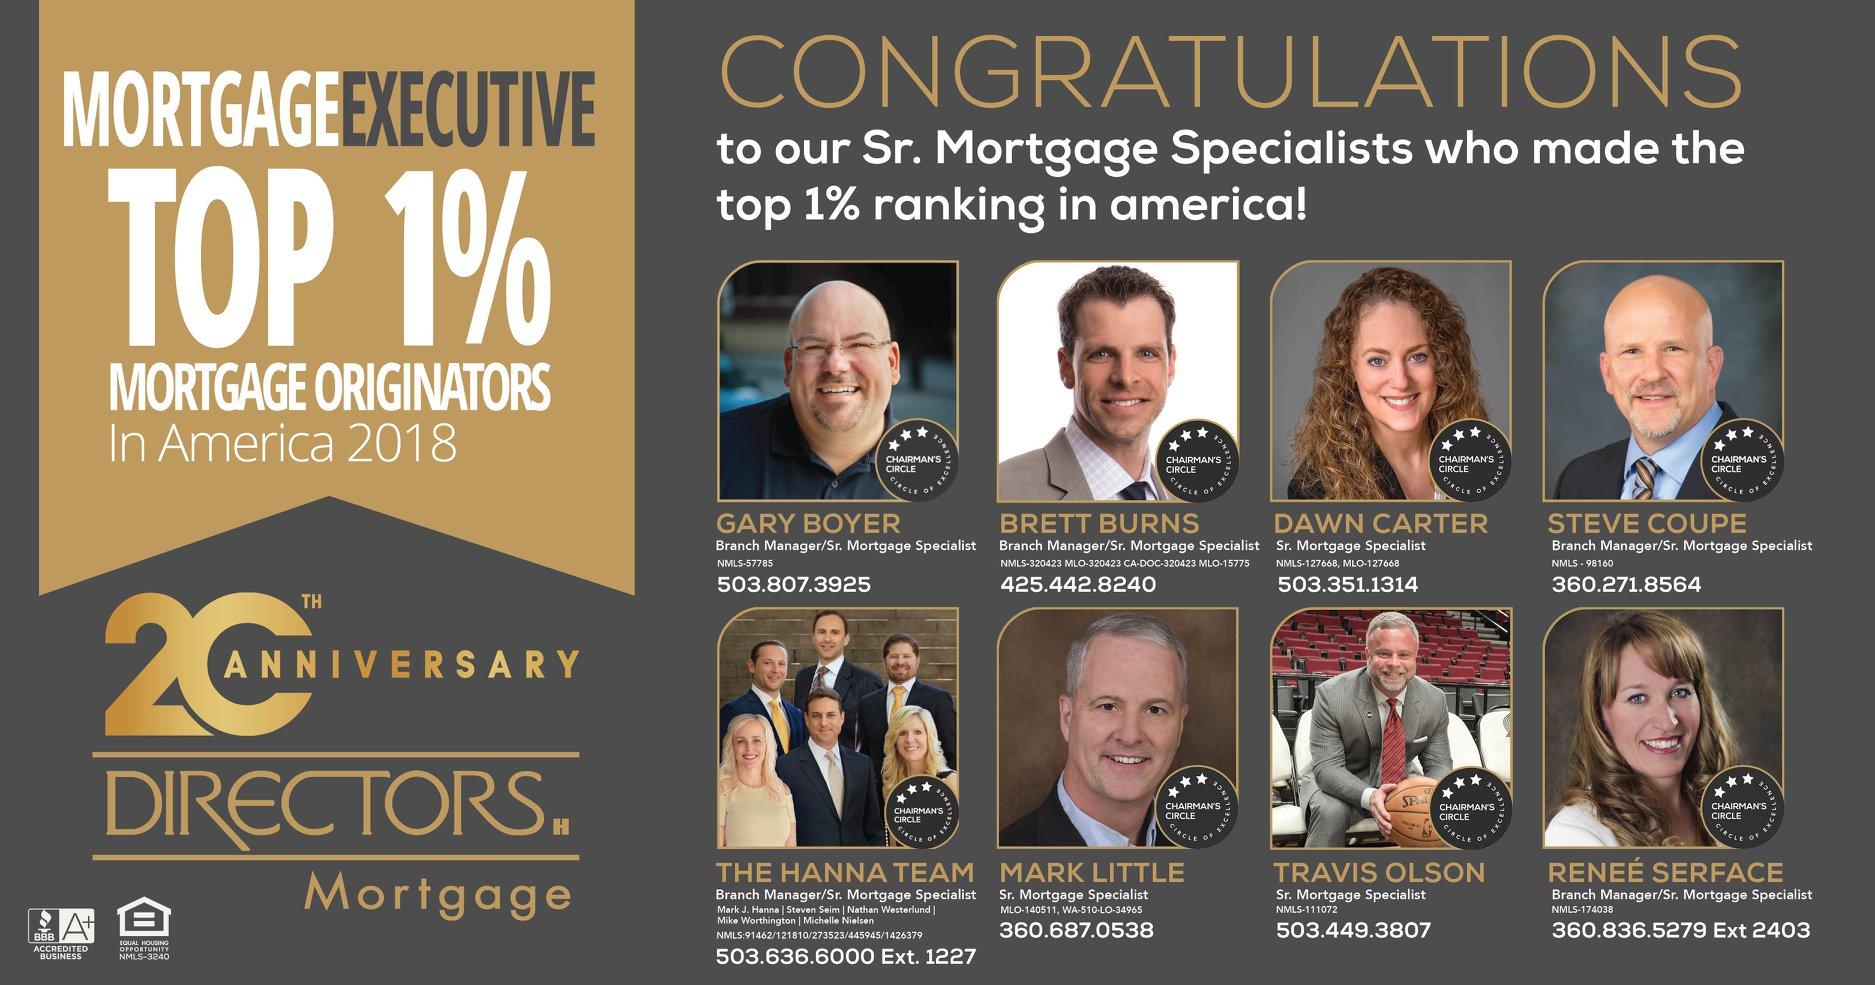 Mortgage Executive Top 1% 2017 Directors Mortgage.jpg